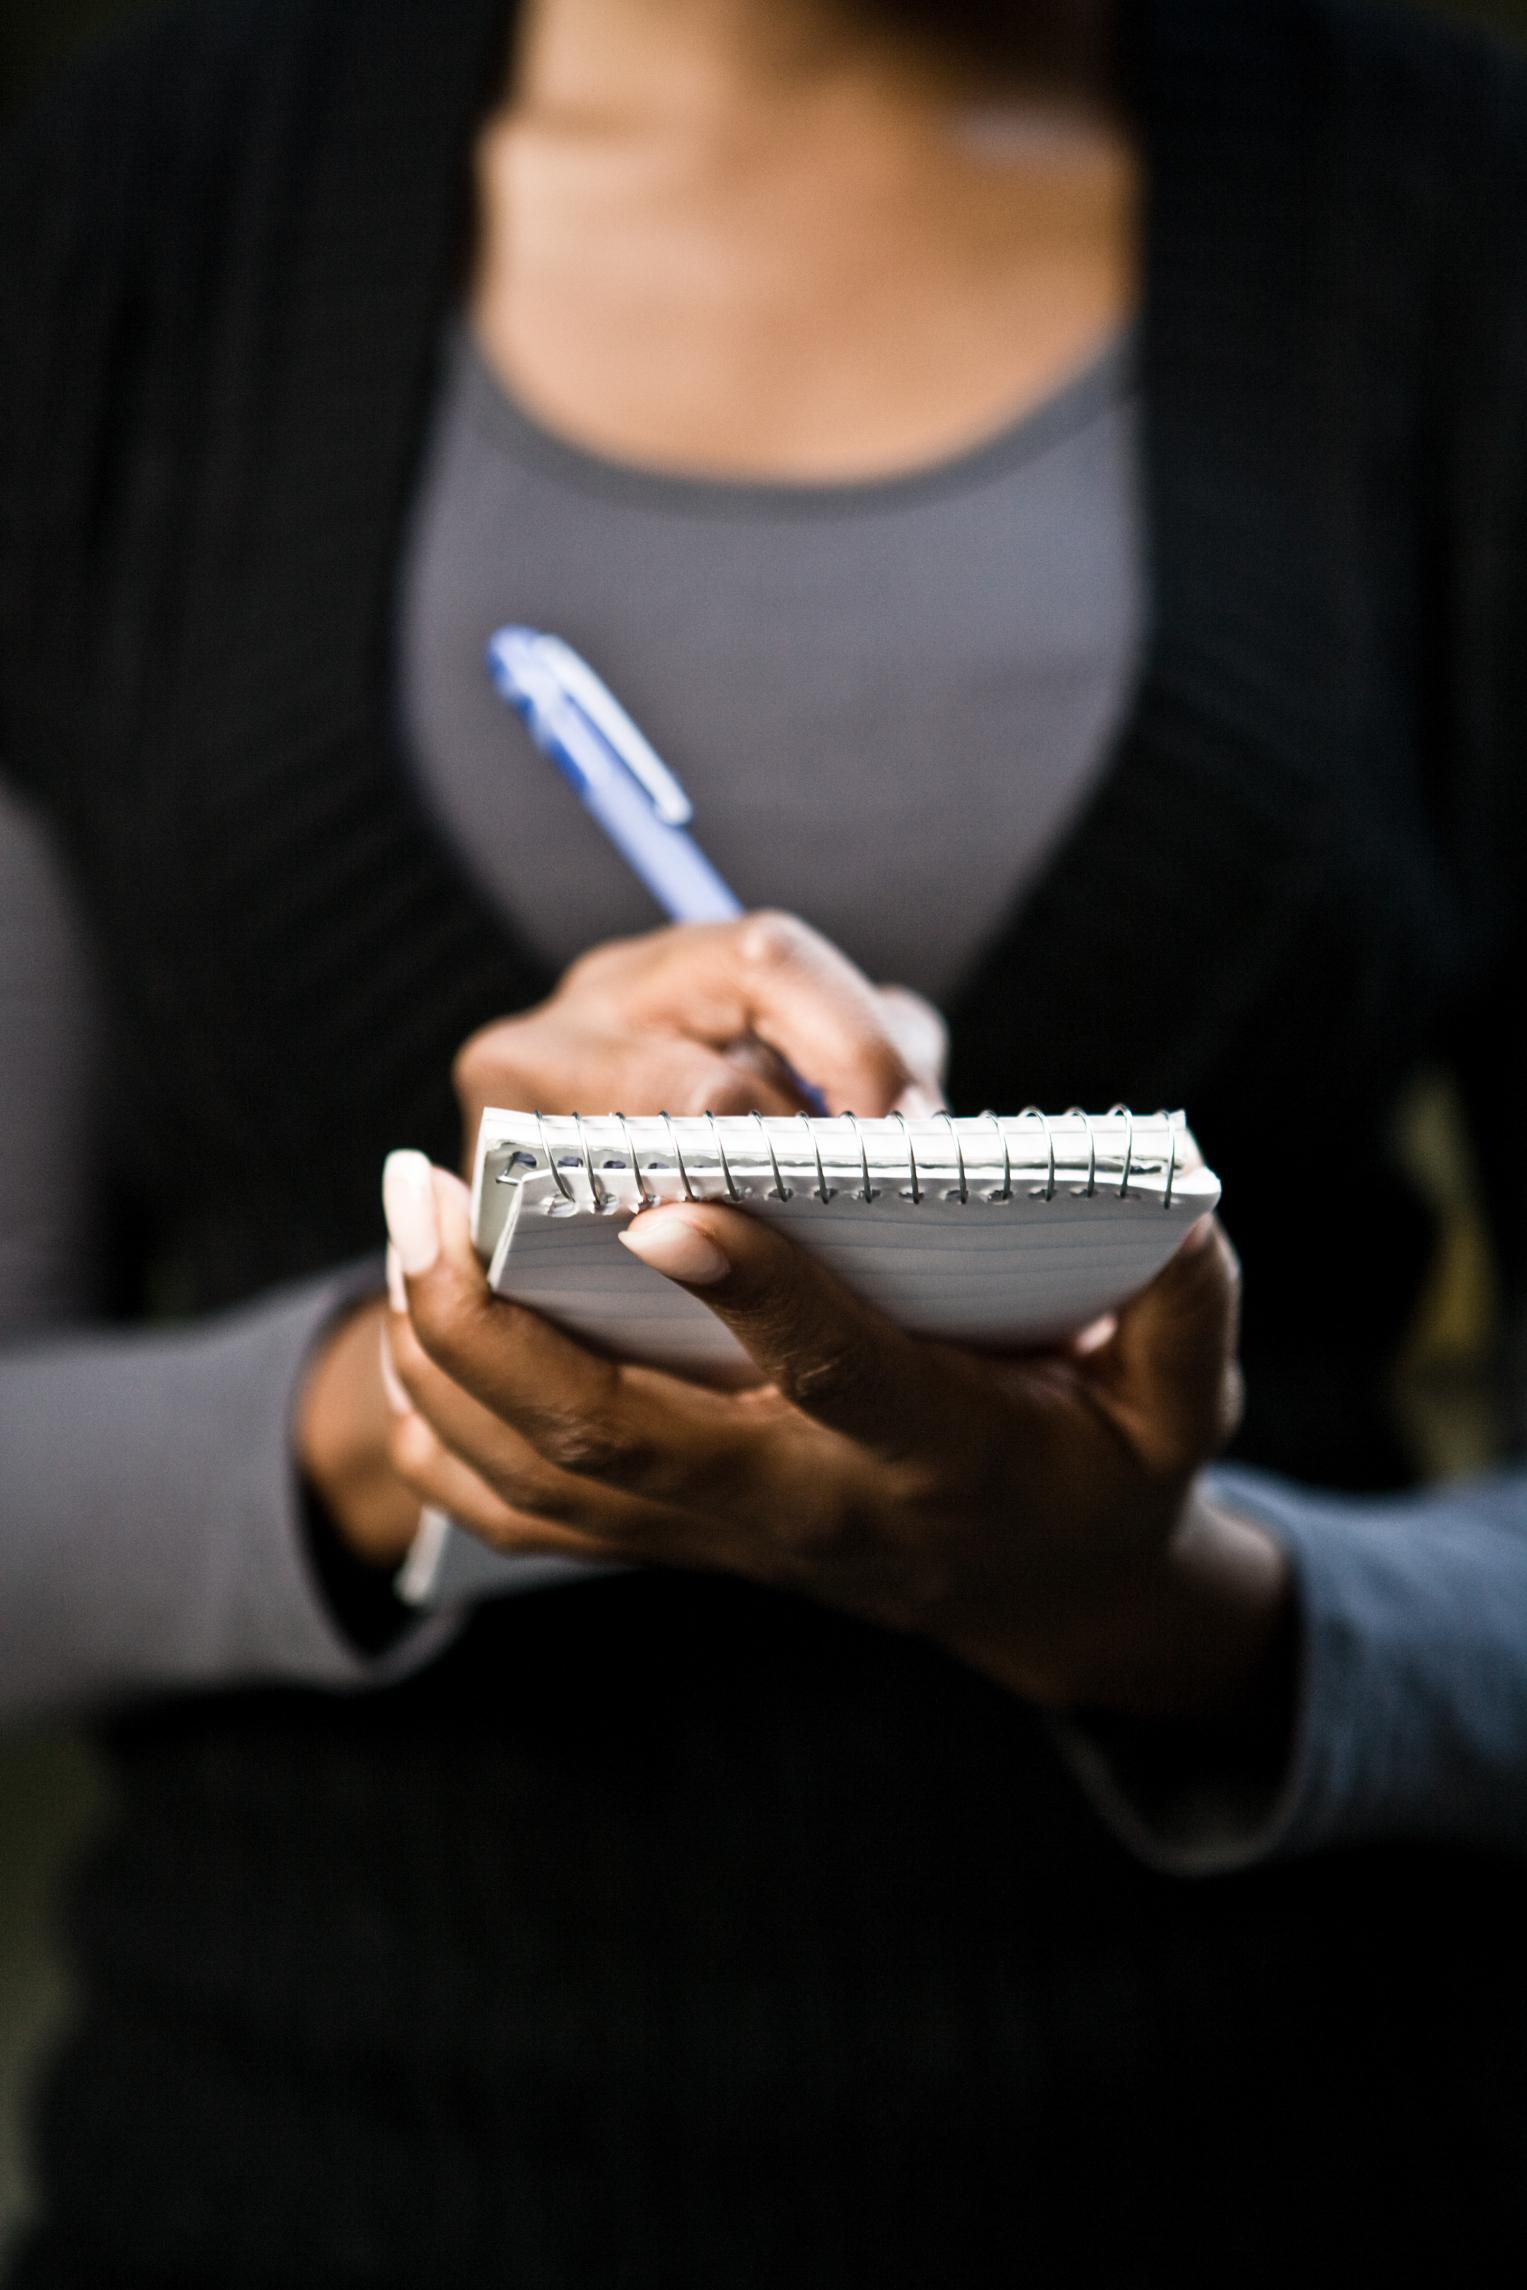 Model essay letter of complaint